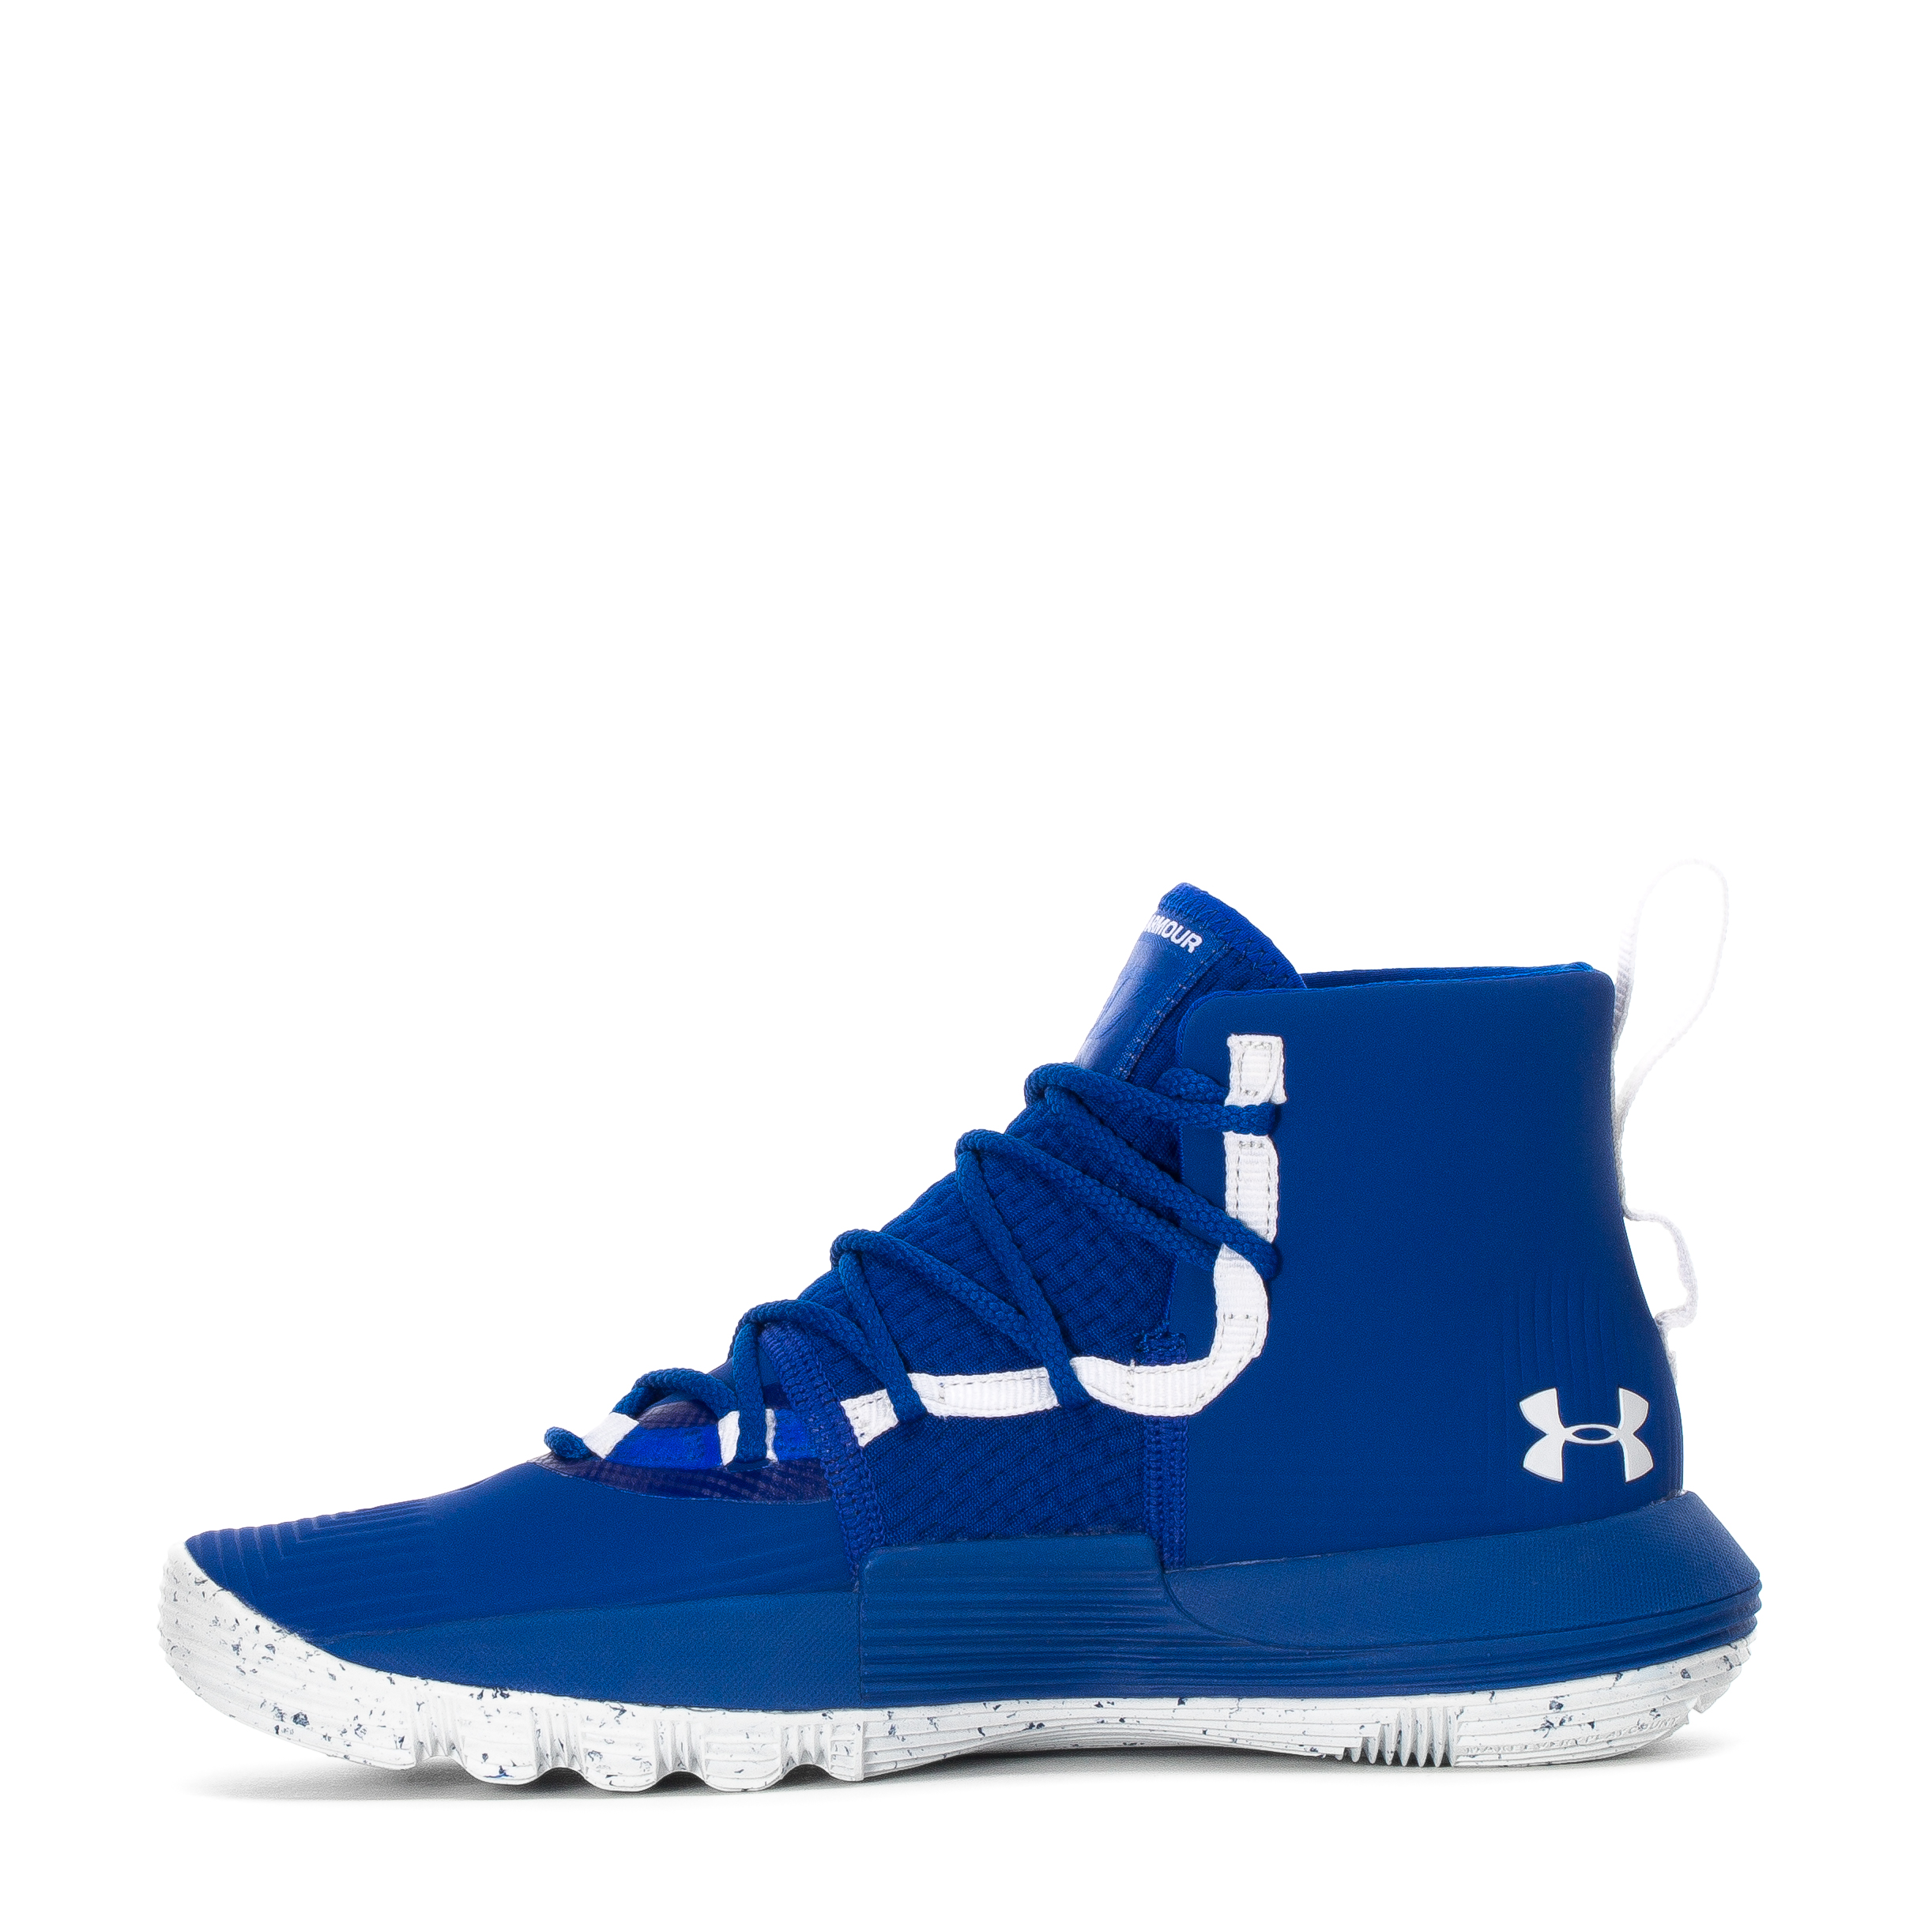 meet 10164 c79f6 Under Armour UA BGS SC 3Zero II Curry Sneakers 3020424-400 ...